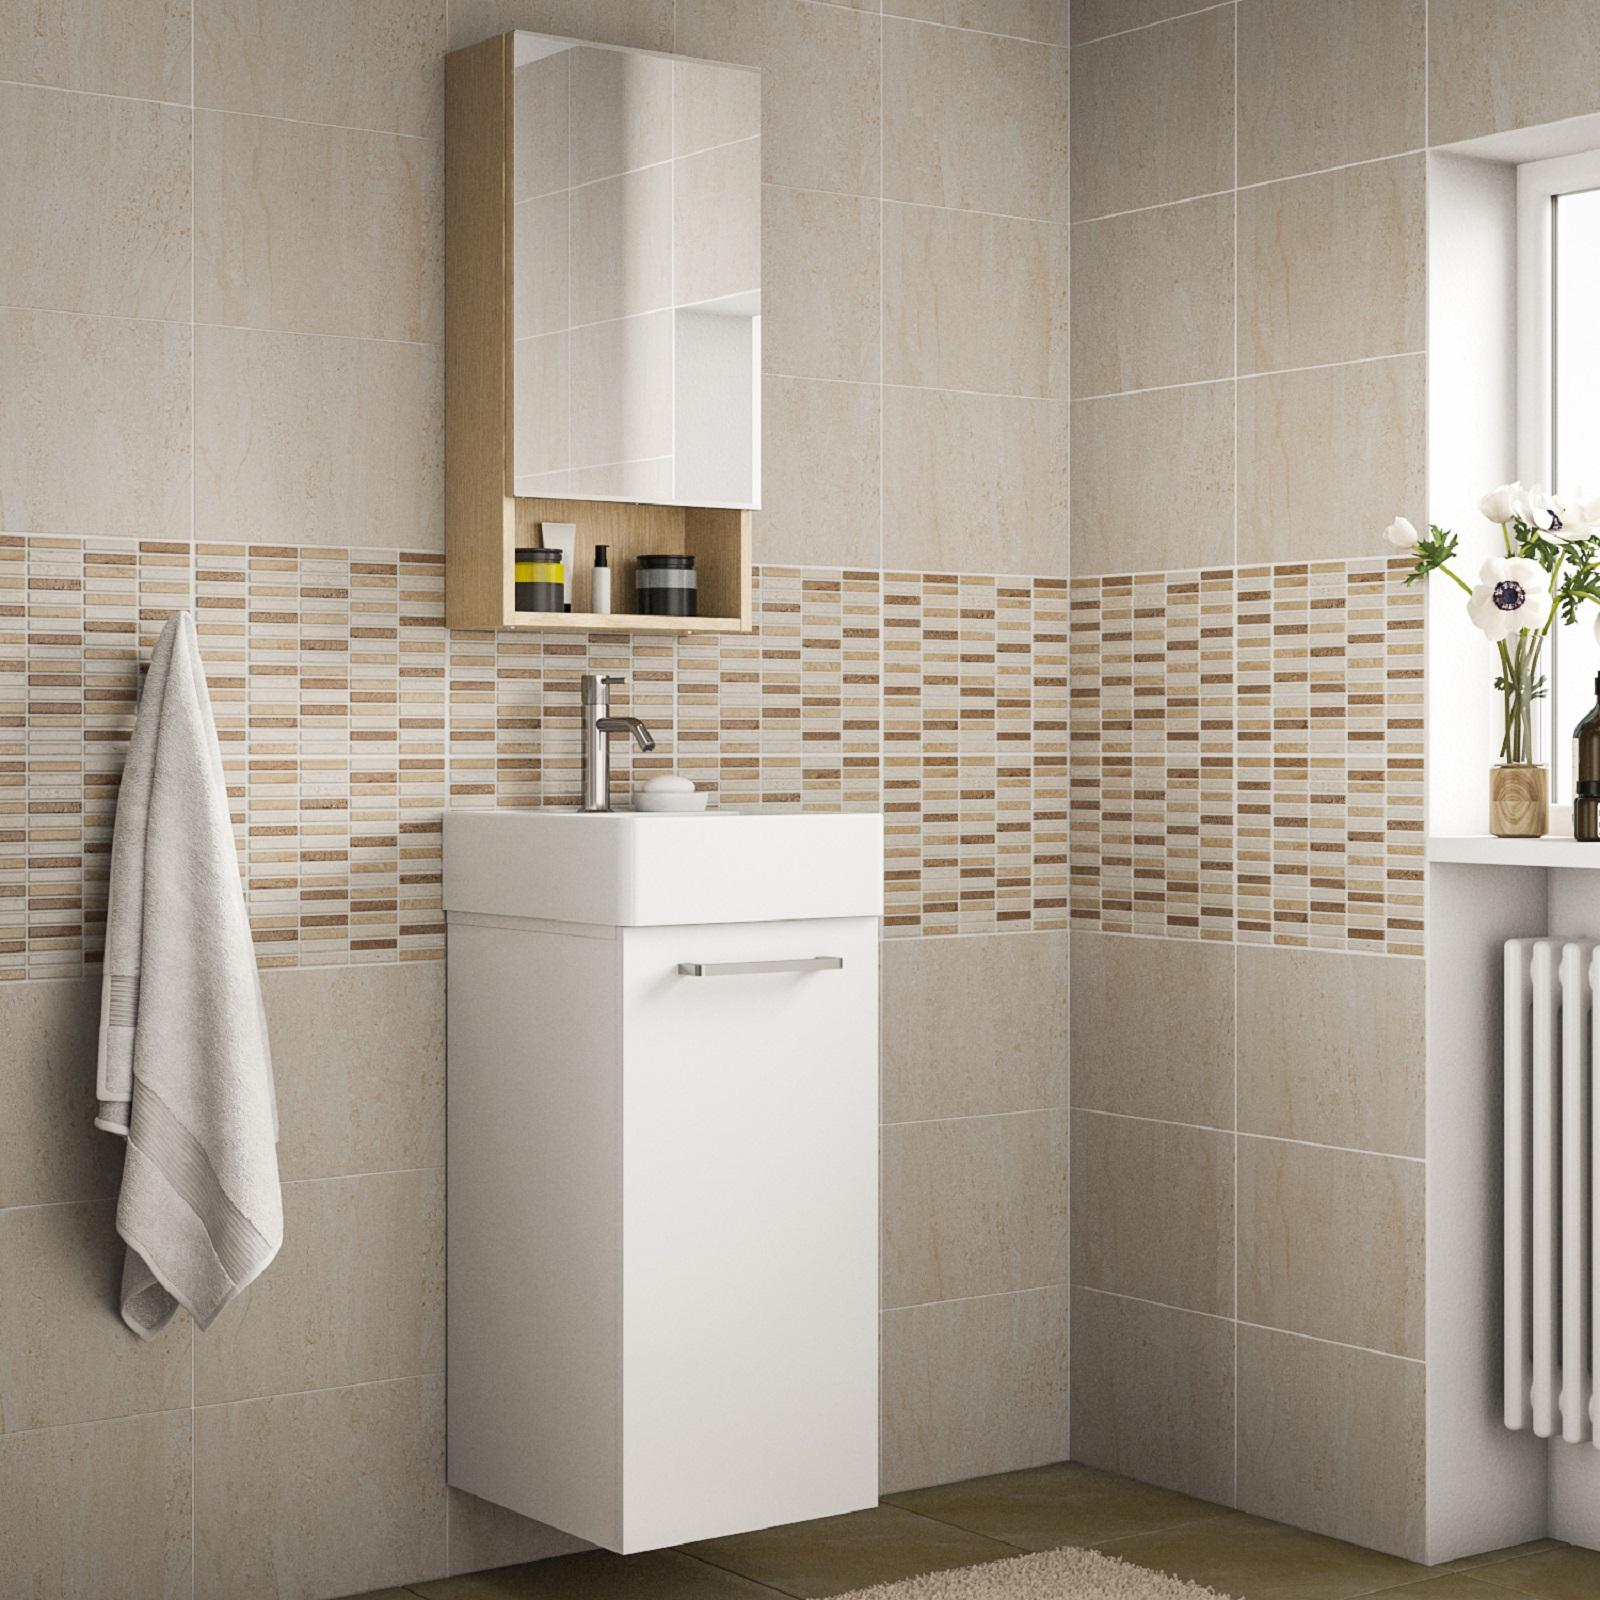 Mobili bagno piccoli con lavabo bianchi in legno o for Leroy merlin lavabo bagno